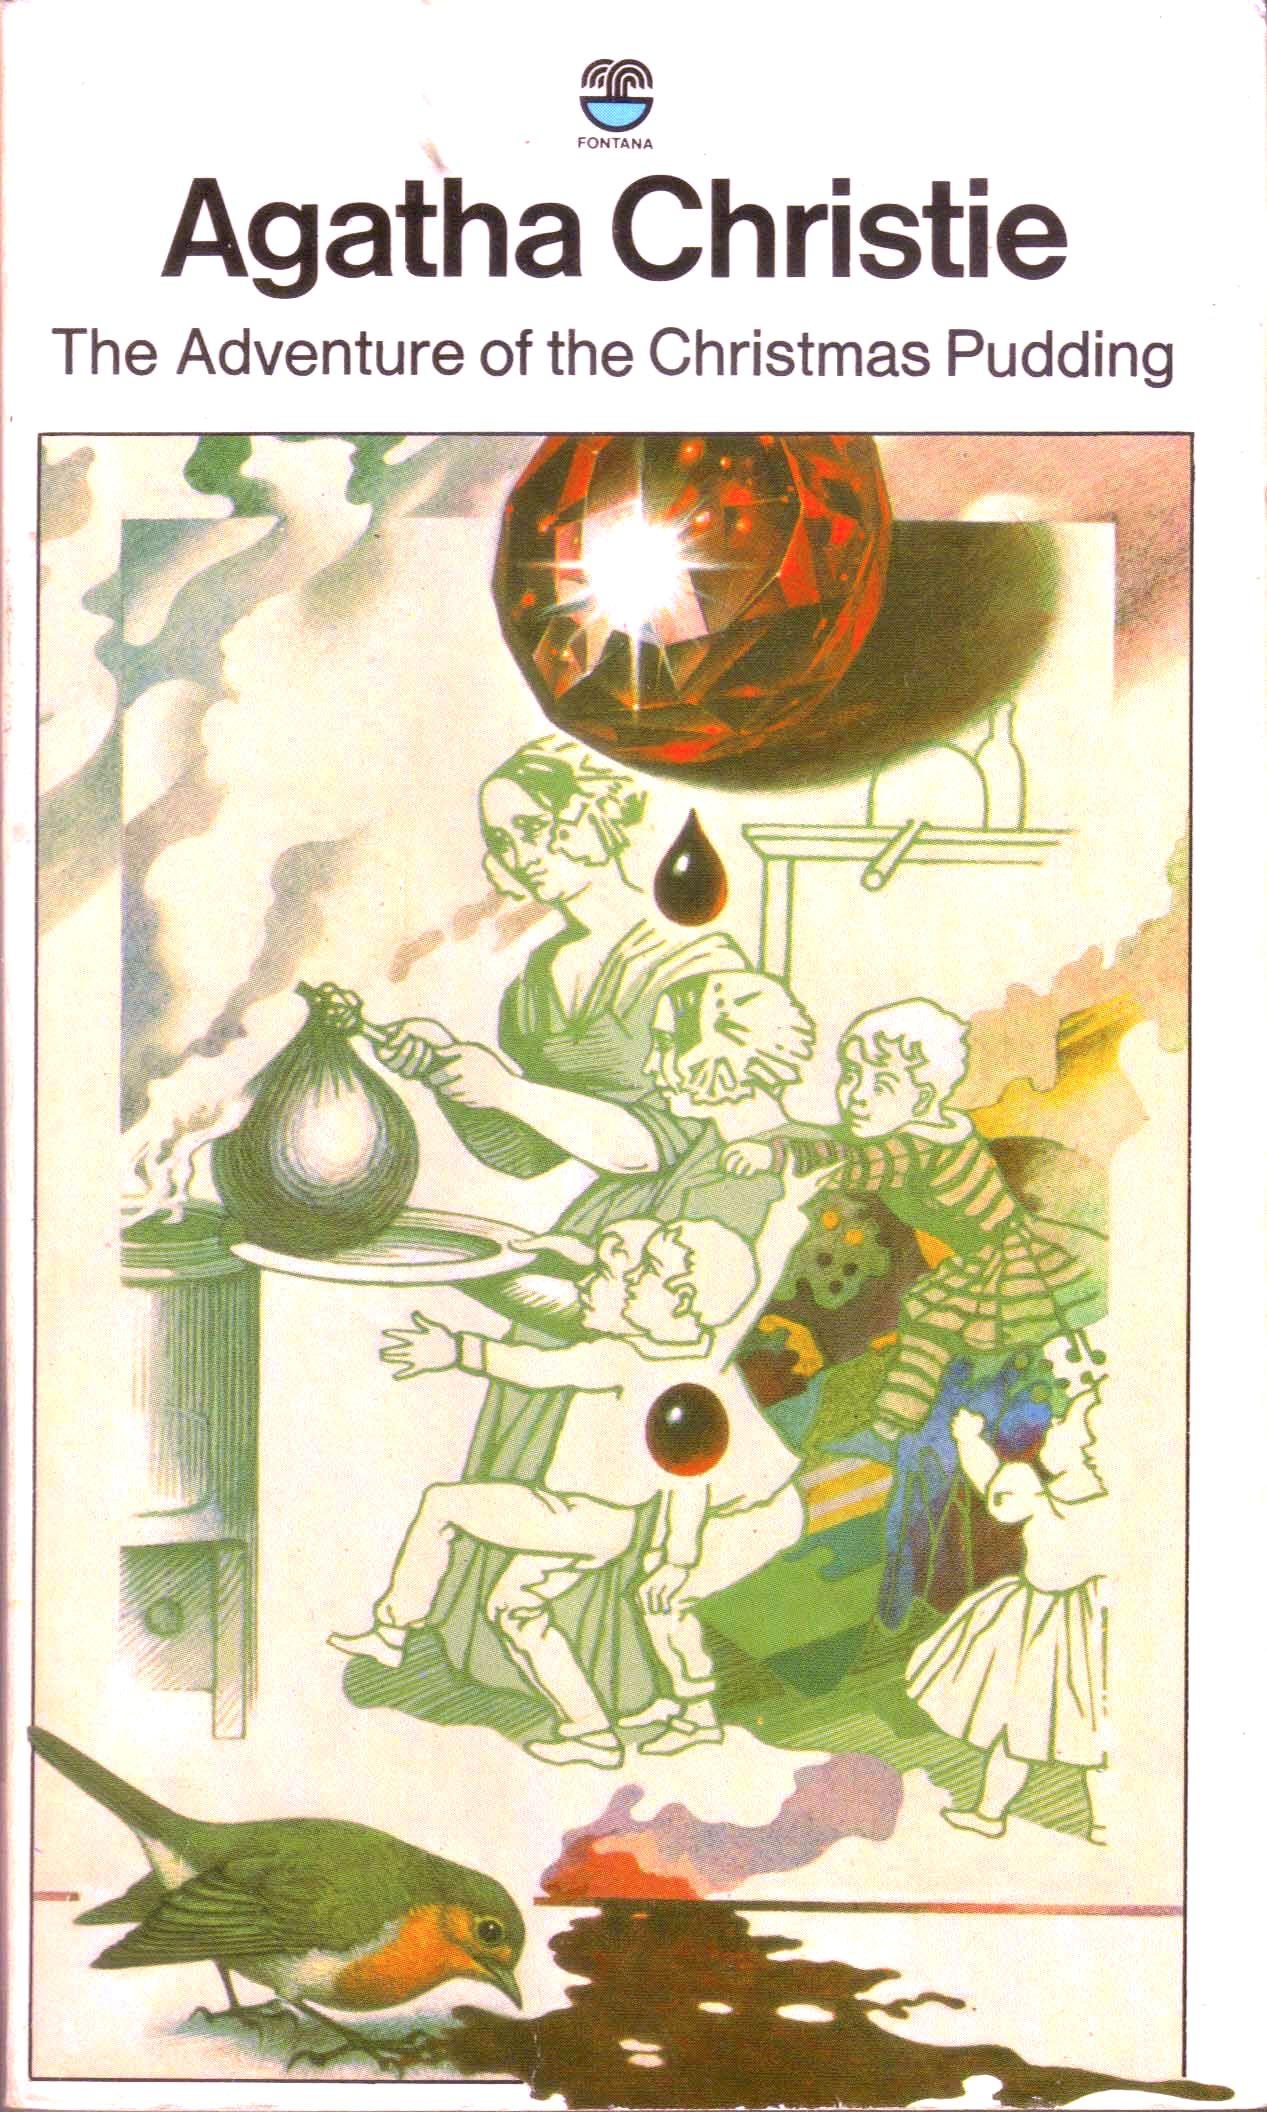 Agatha Christie Tom Adams The Adventure of the Christmas Pudding 2